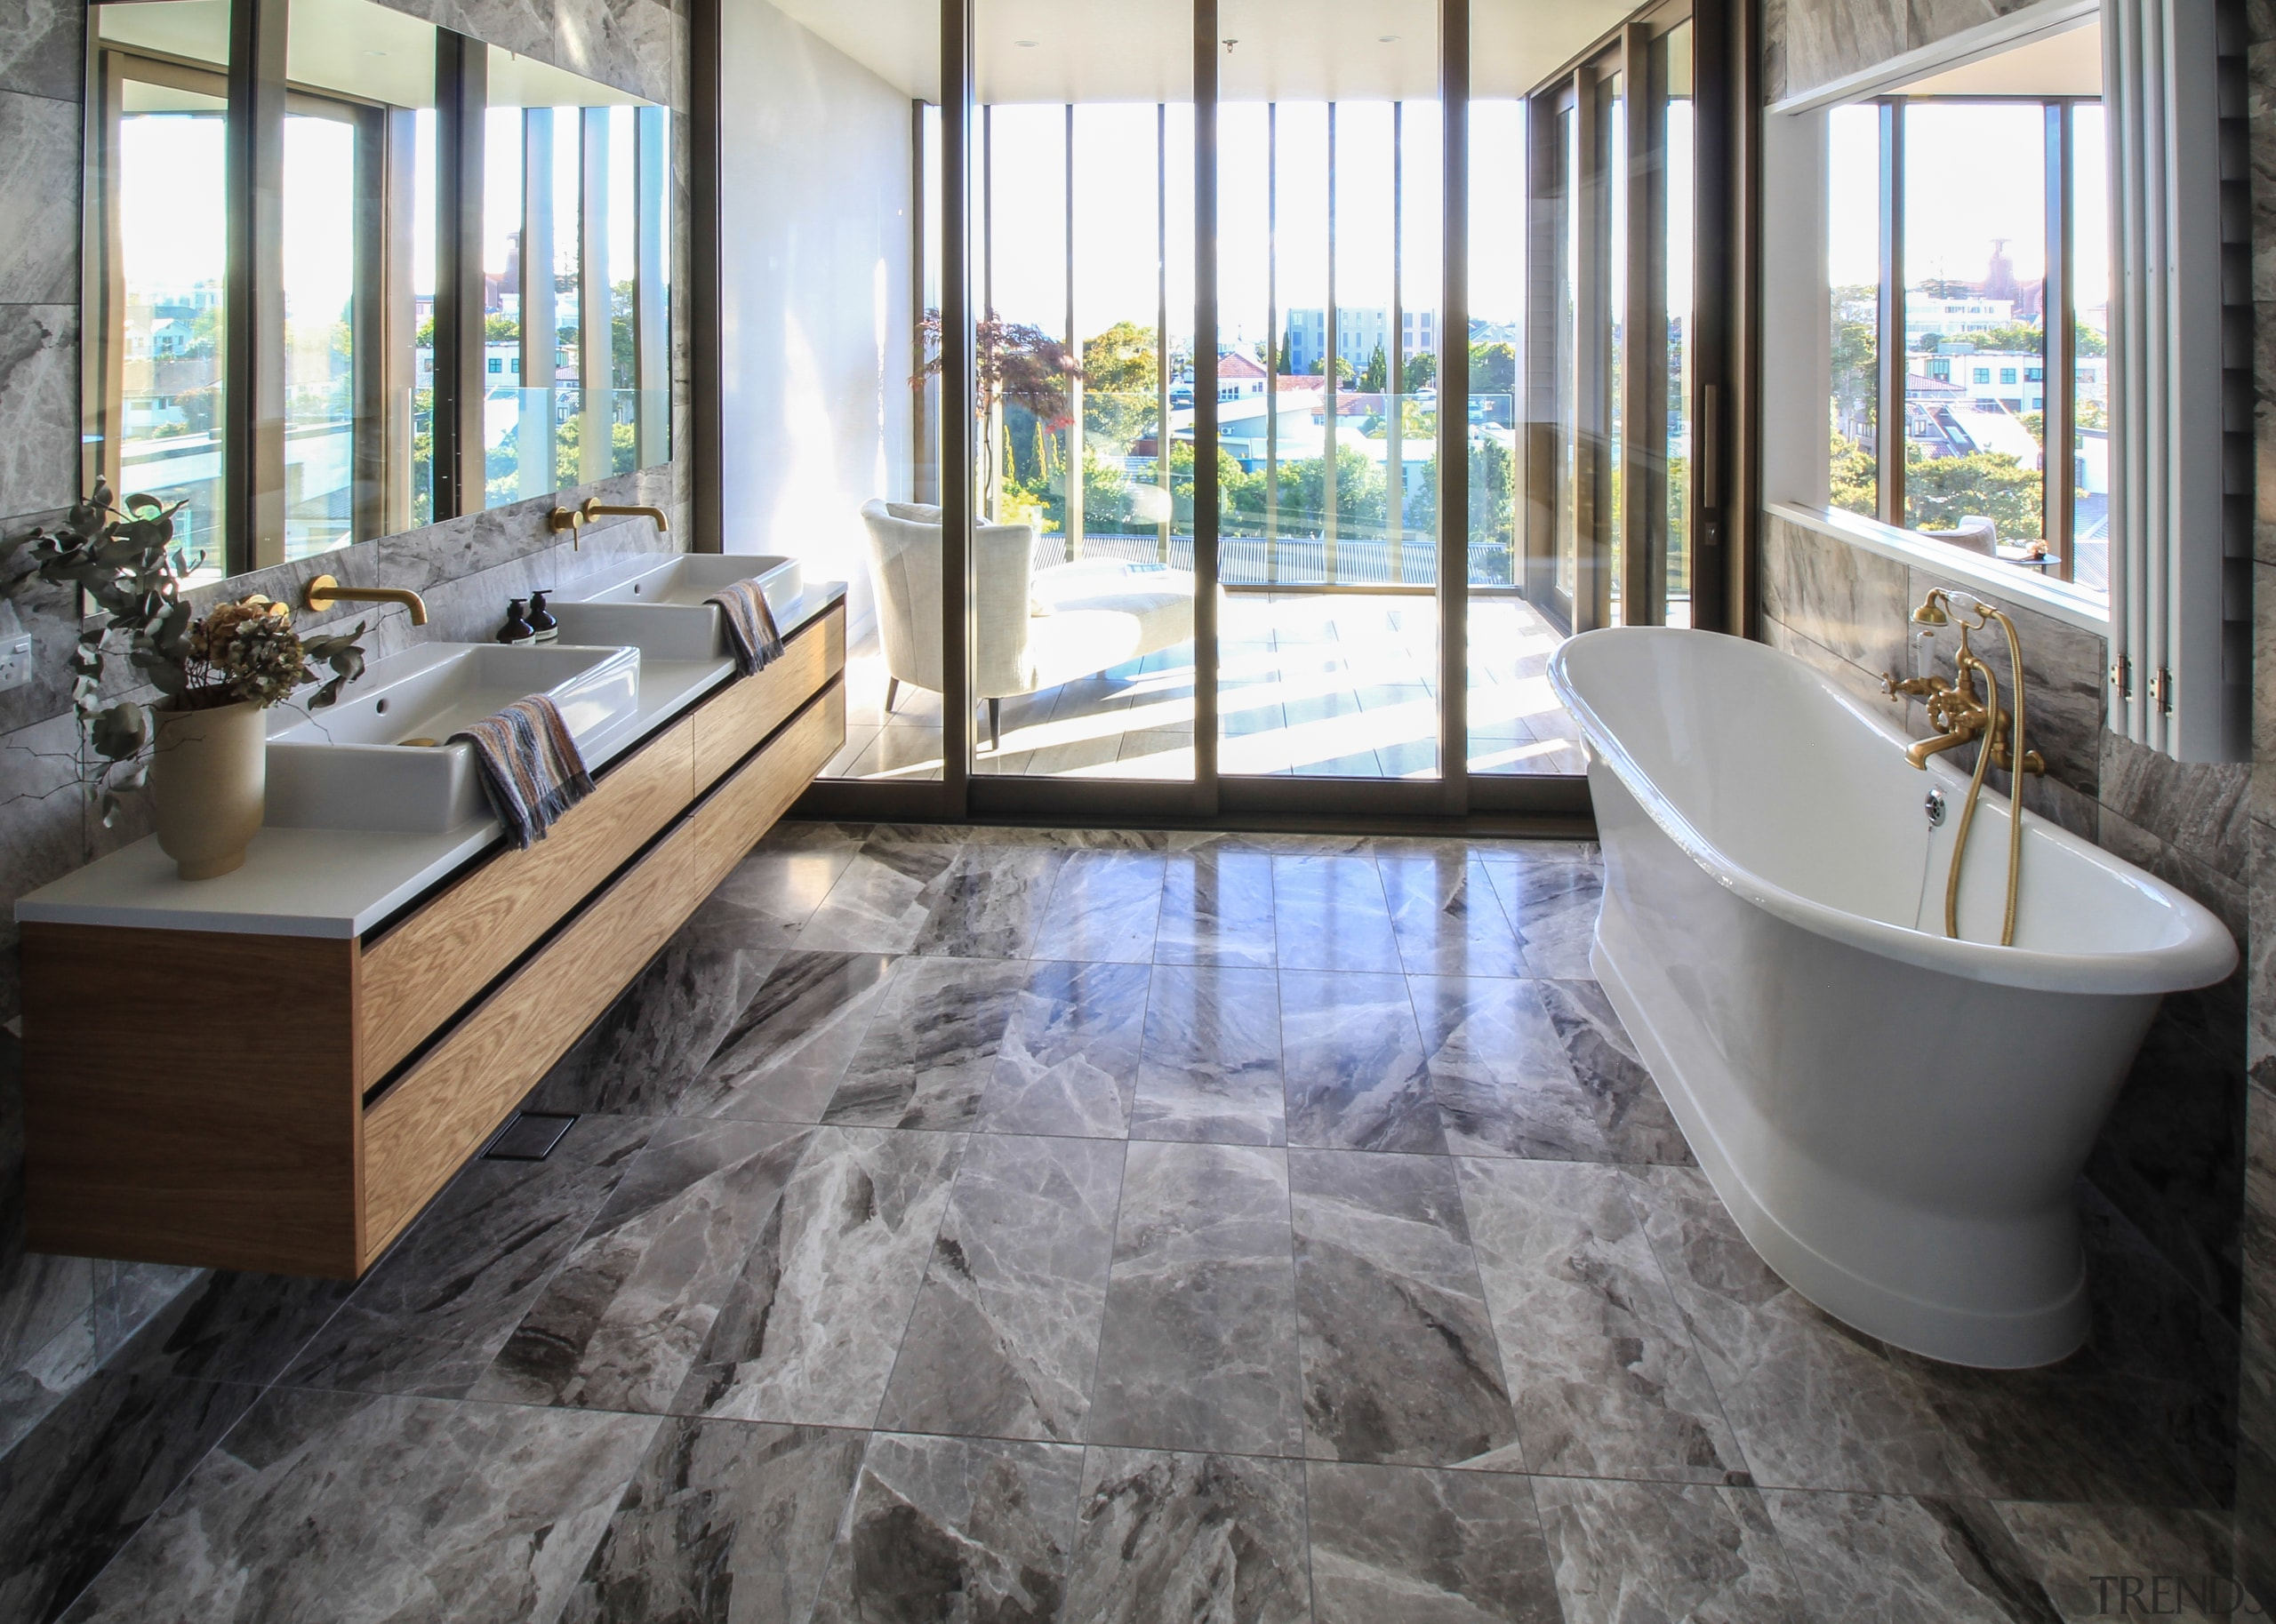 A freestanding tub and stone floors and walls bathroom, flooring, home, interior design, laminate flooring, bathroom, tile, Dominion Constructors